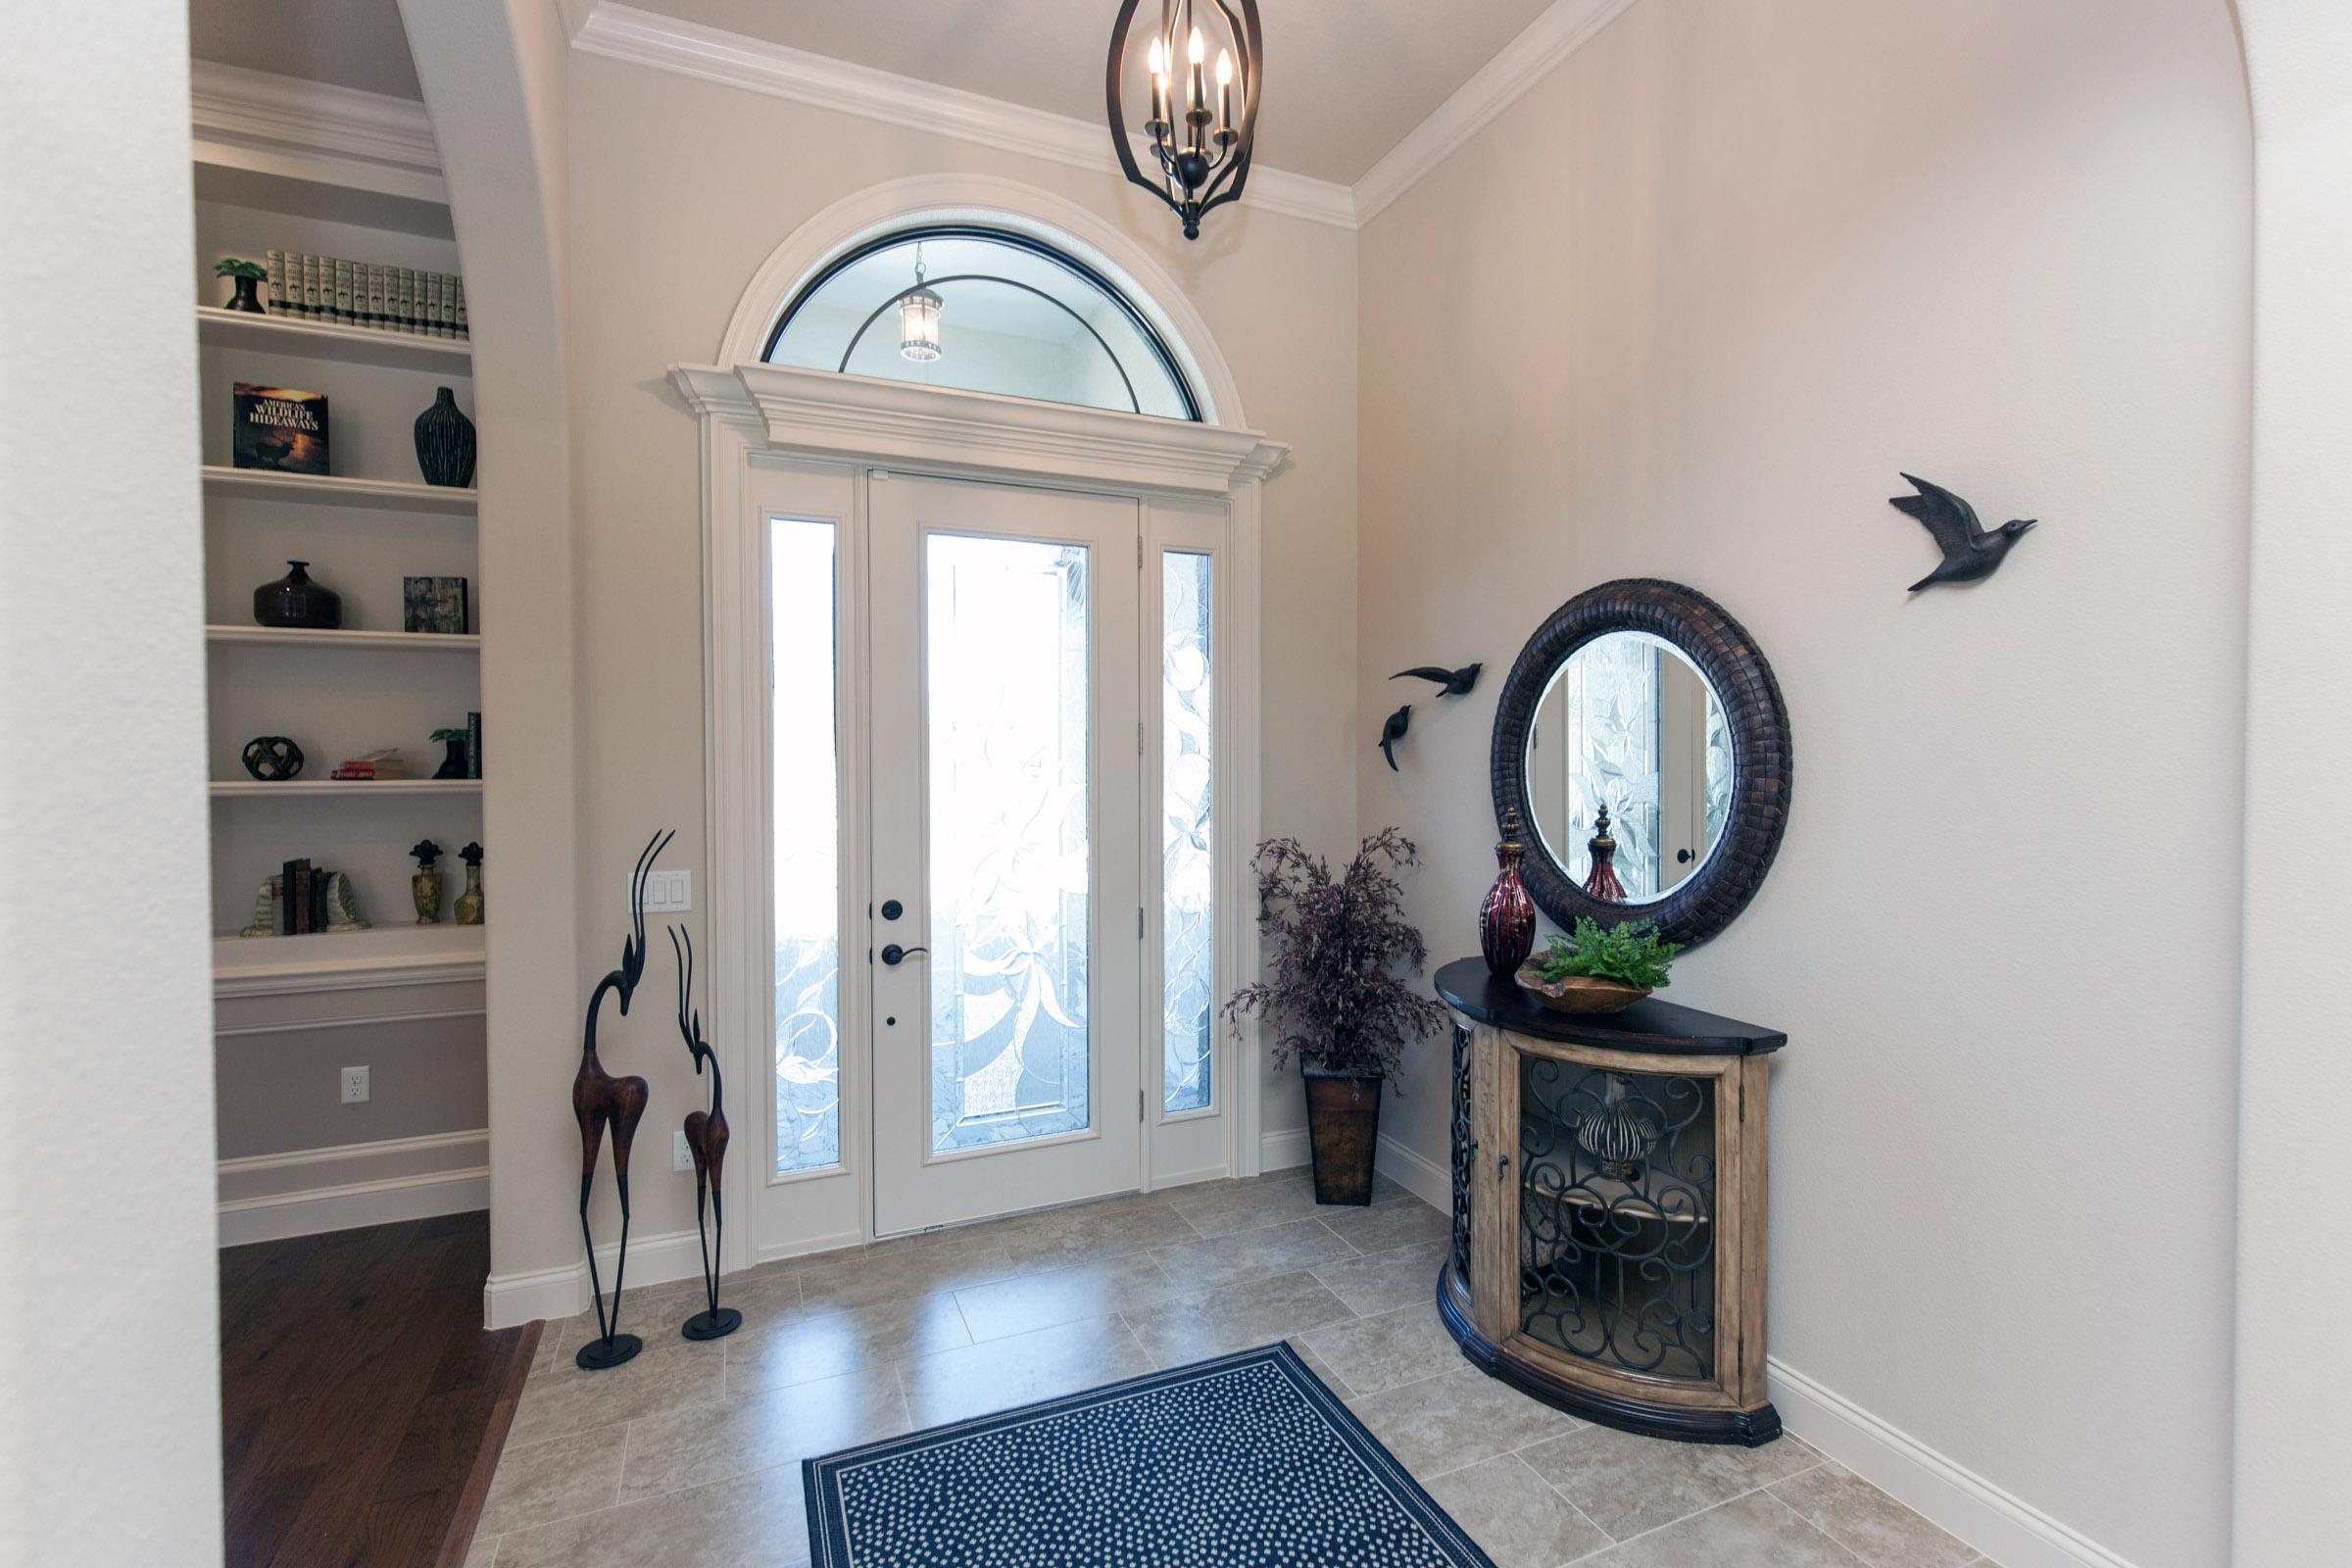 Inside of front door entrance of home